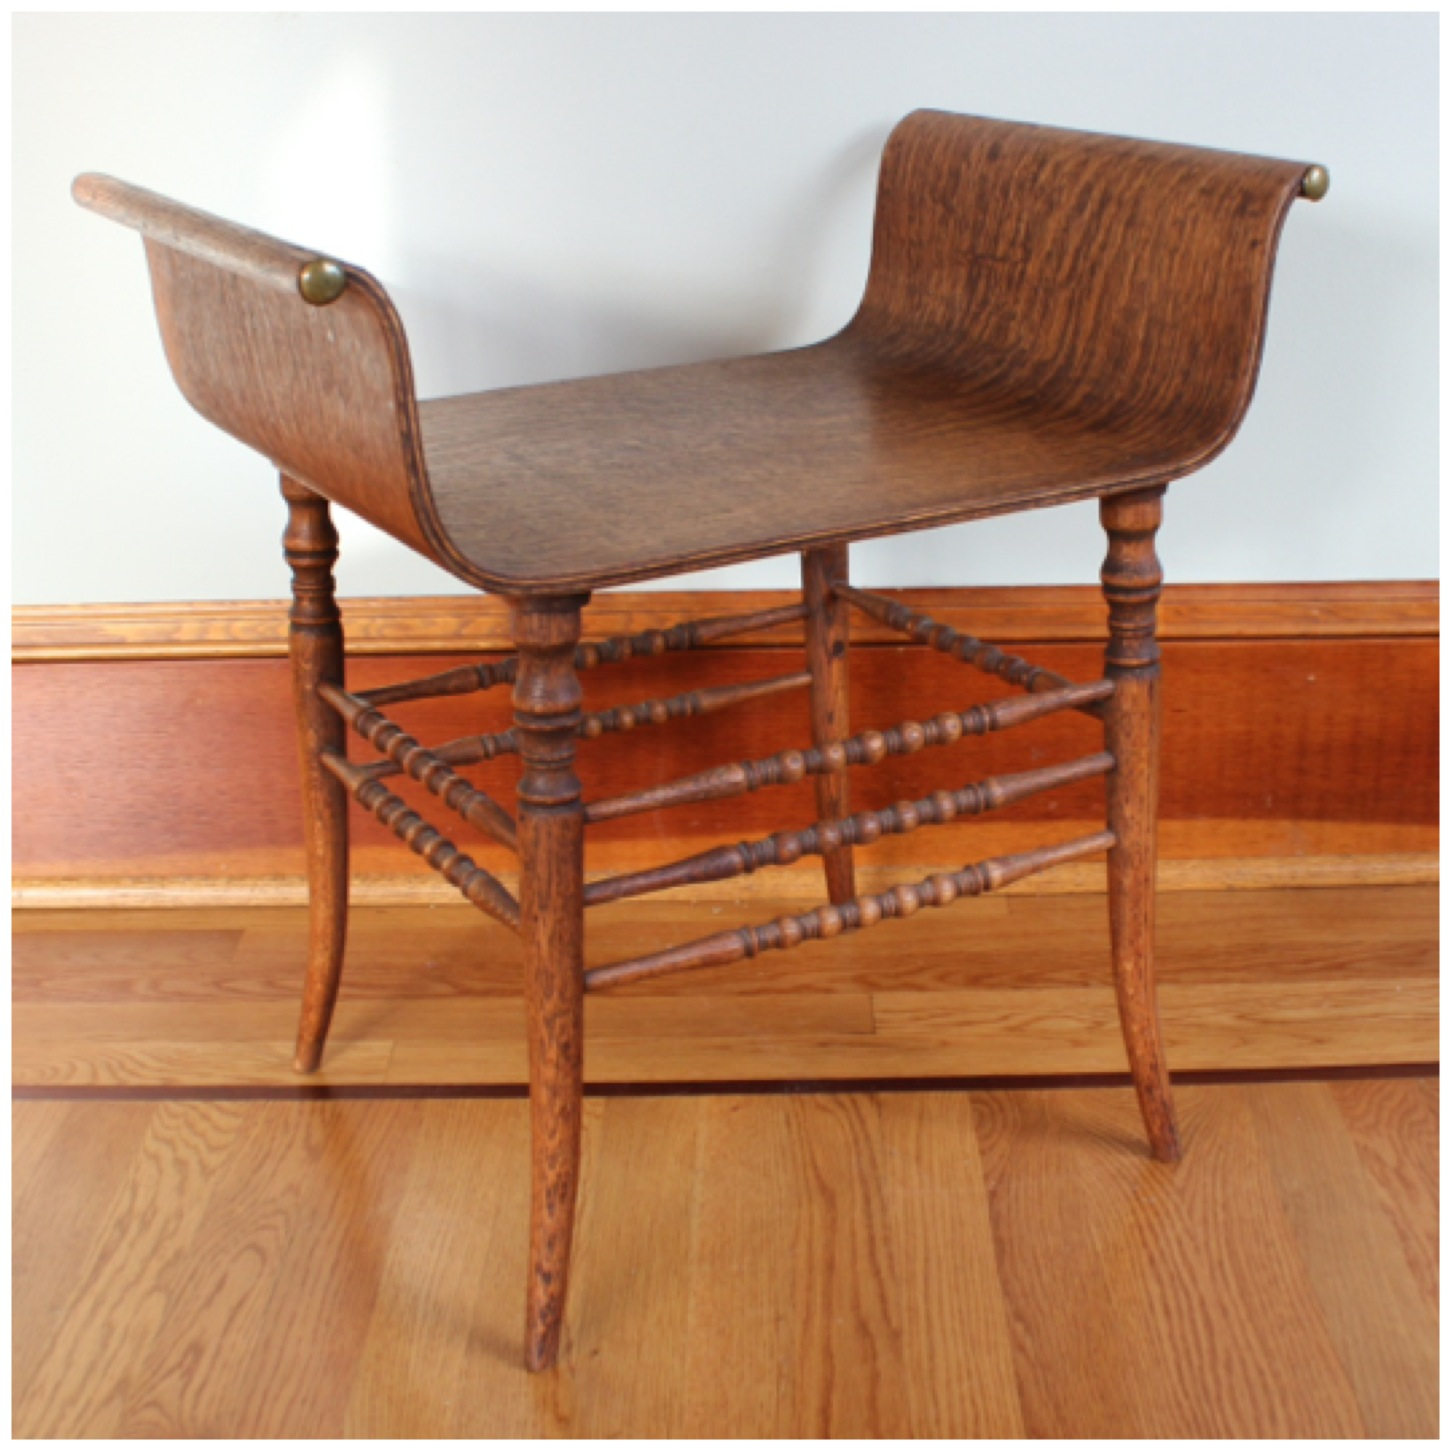 #F4475 Oak Vanity Bench - F4475 Oak Vanity Bench Bogart, Bremmer & Bradley Antiques